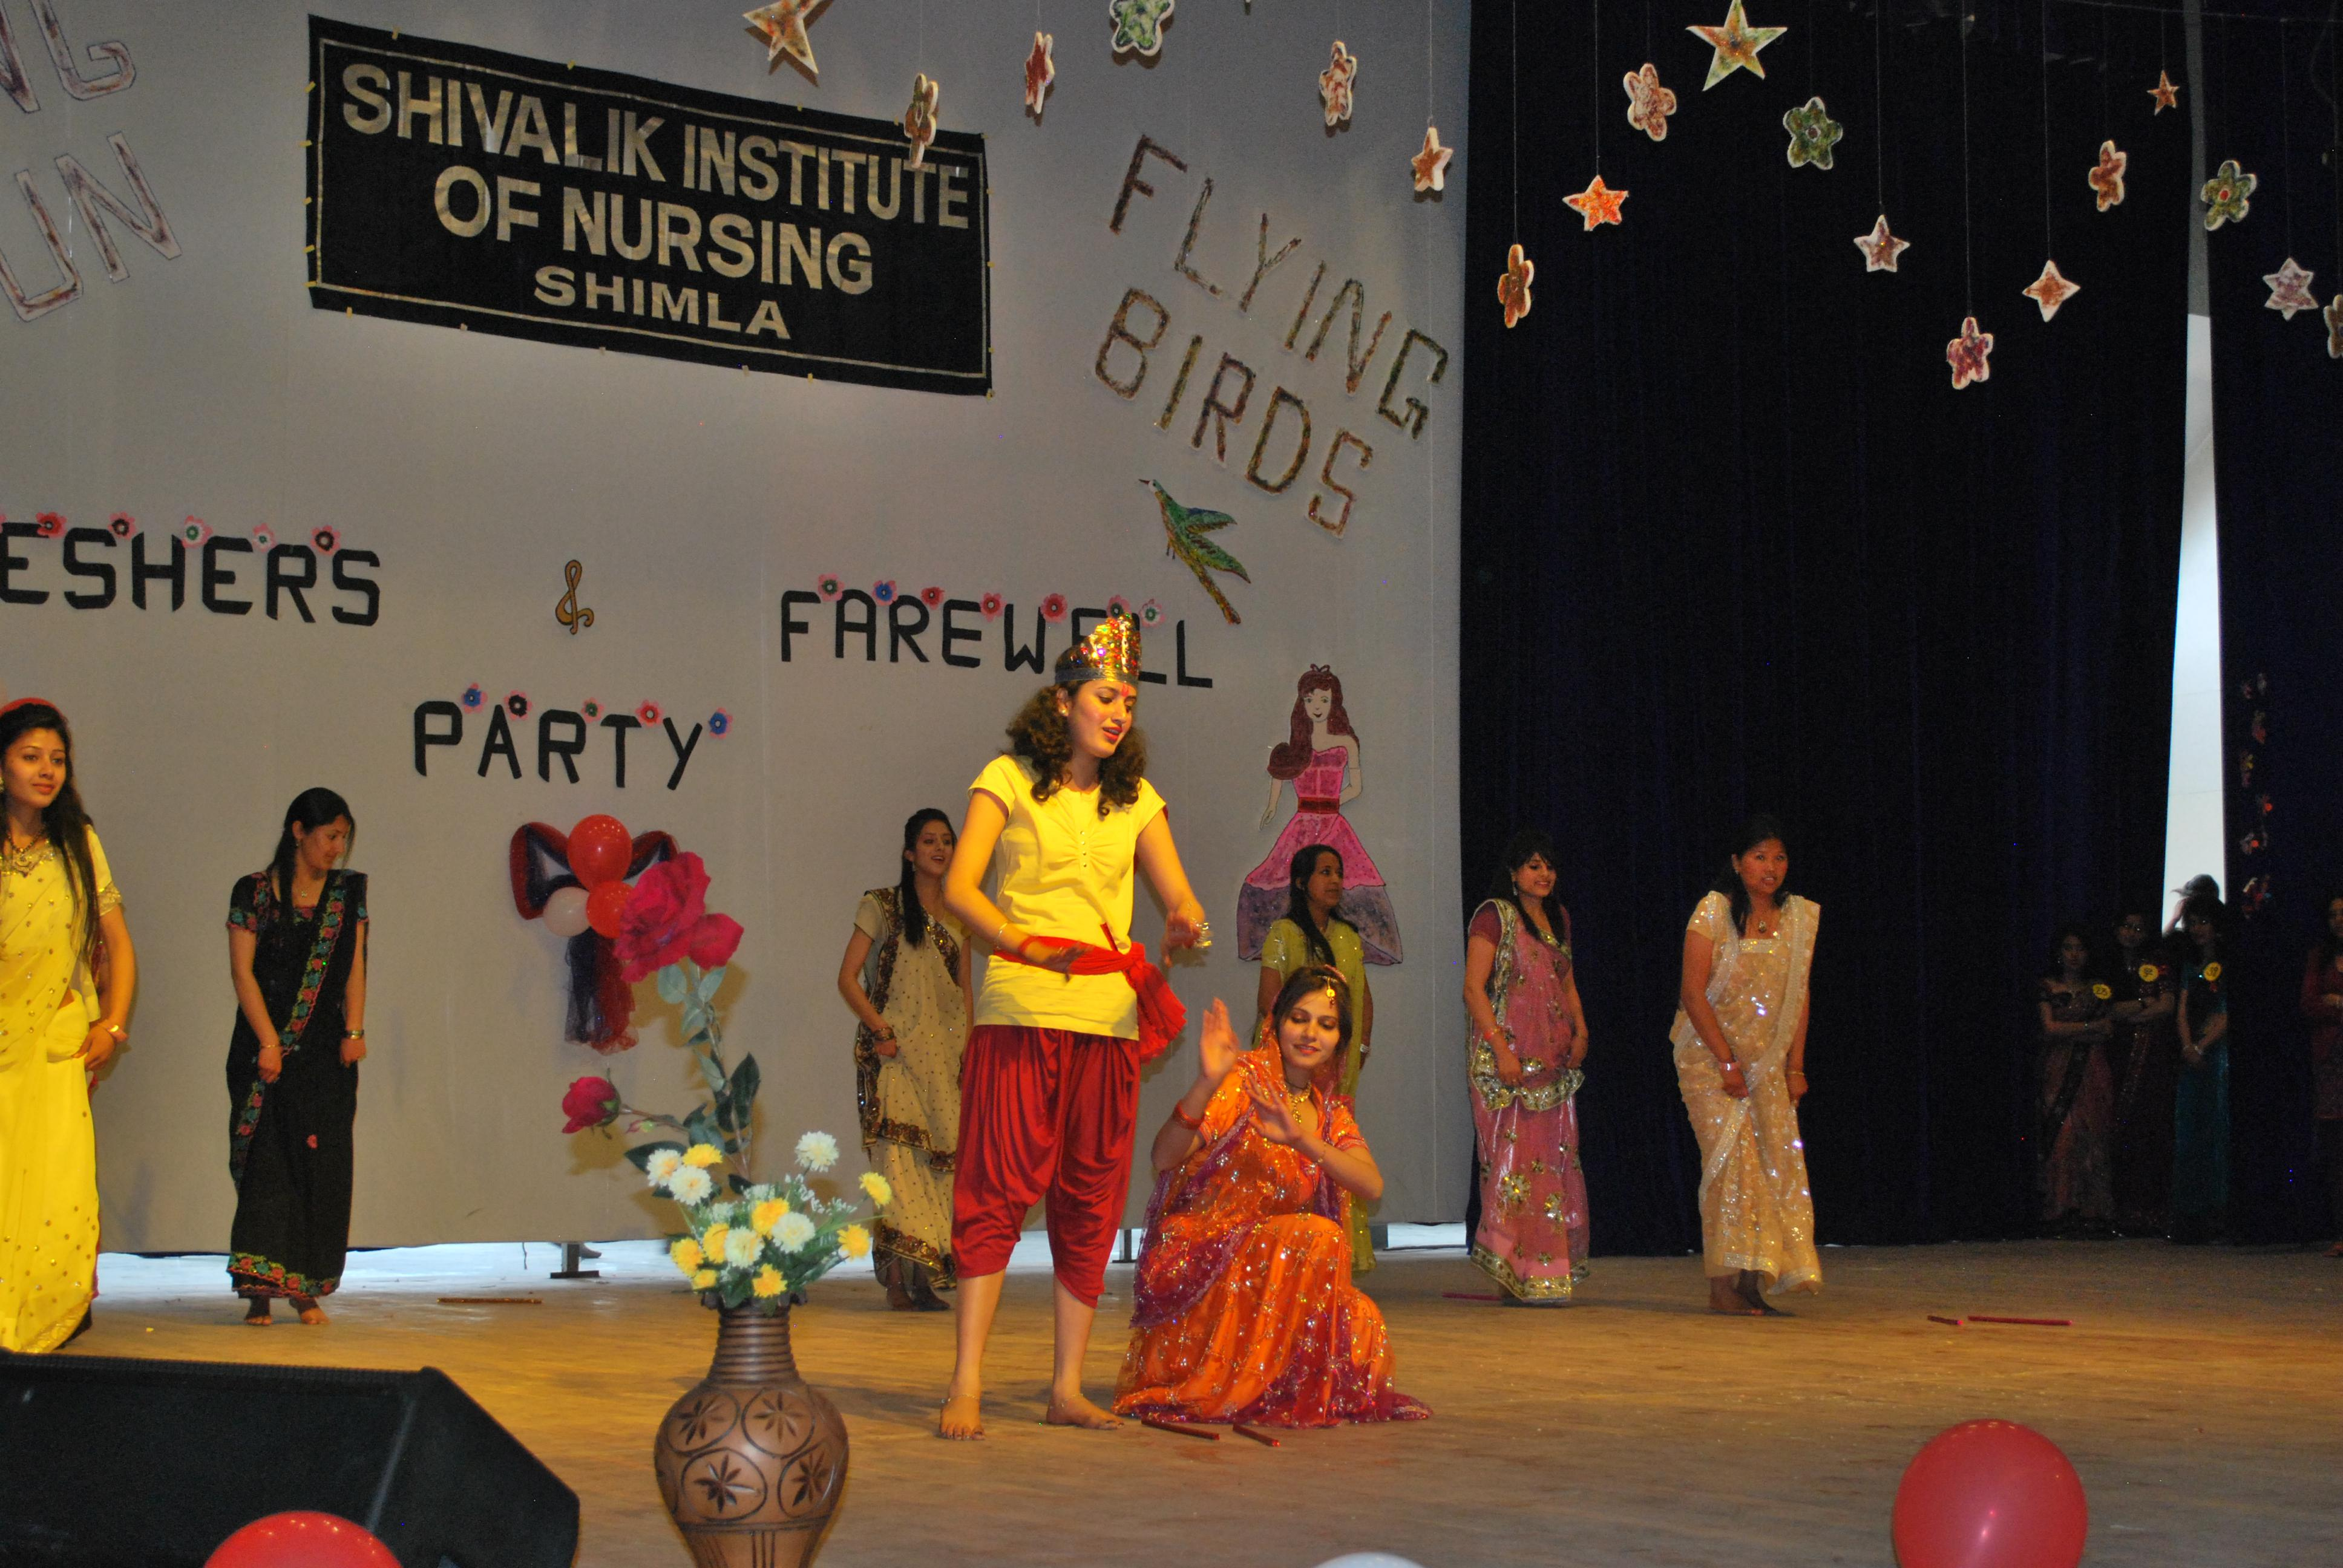 Shivalik Institute Of Nursing Image